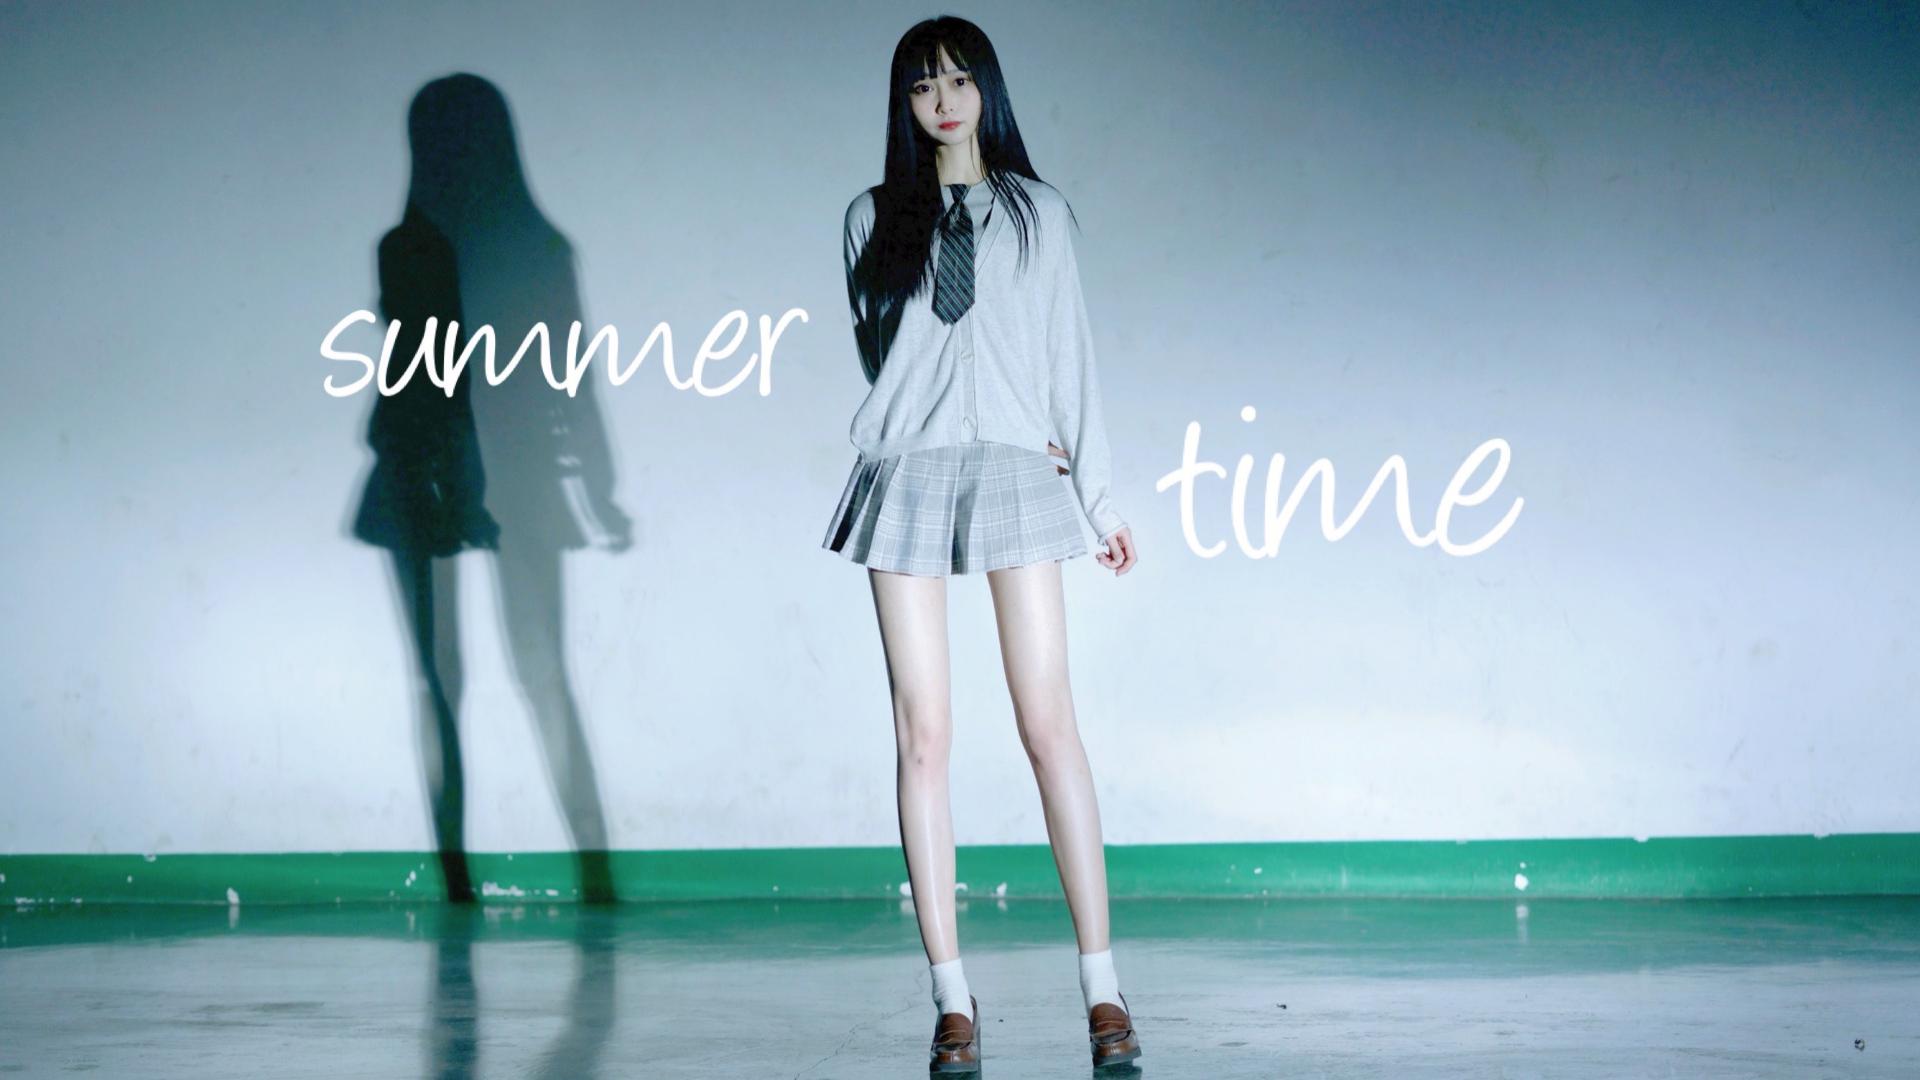 【Ymei】Summertime 停车场那个女孩.❅。°❆·